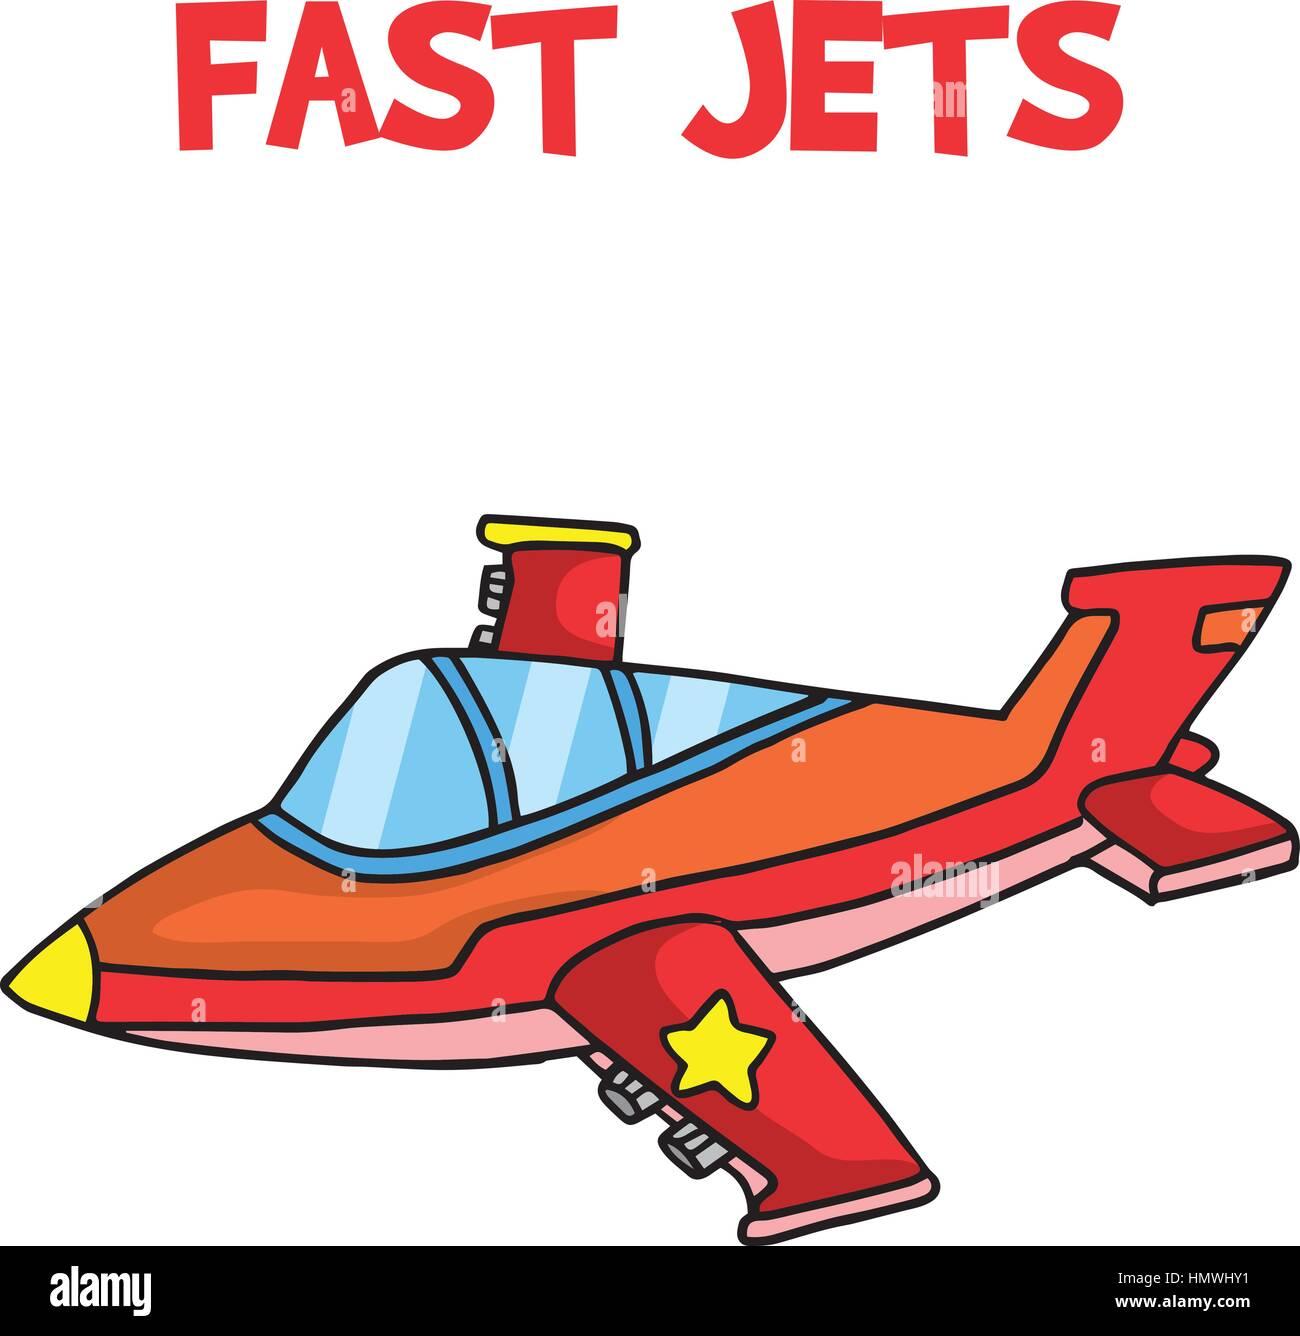 transport of fast jets cartoon stock vector art illustration rh alamy com cartoon jetsons dog jet ski cartoon